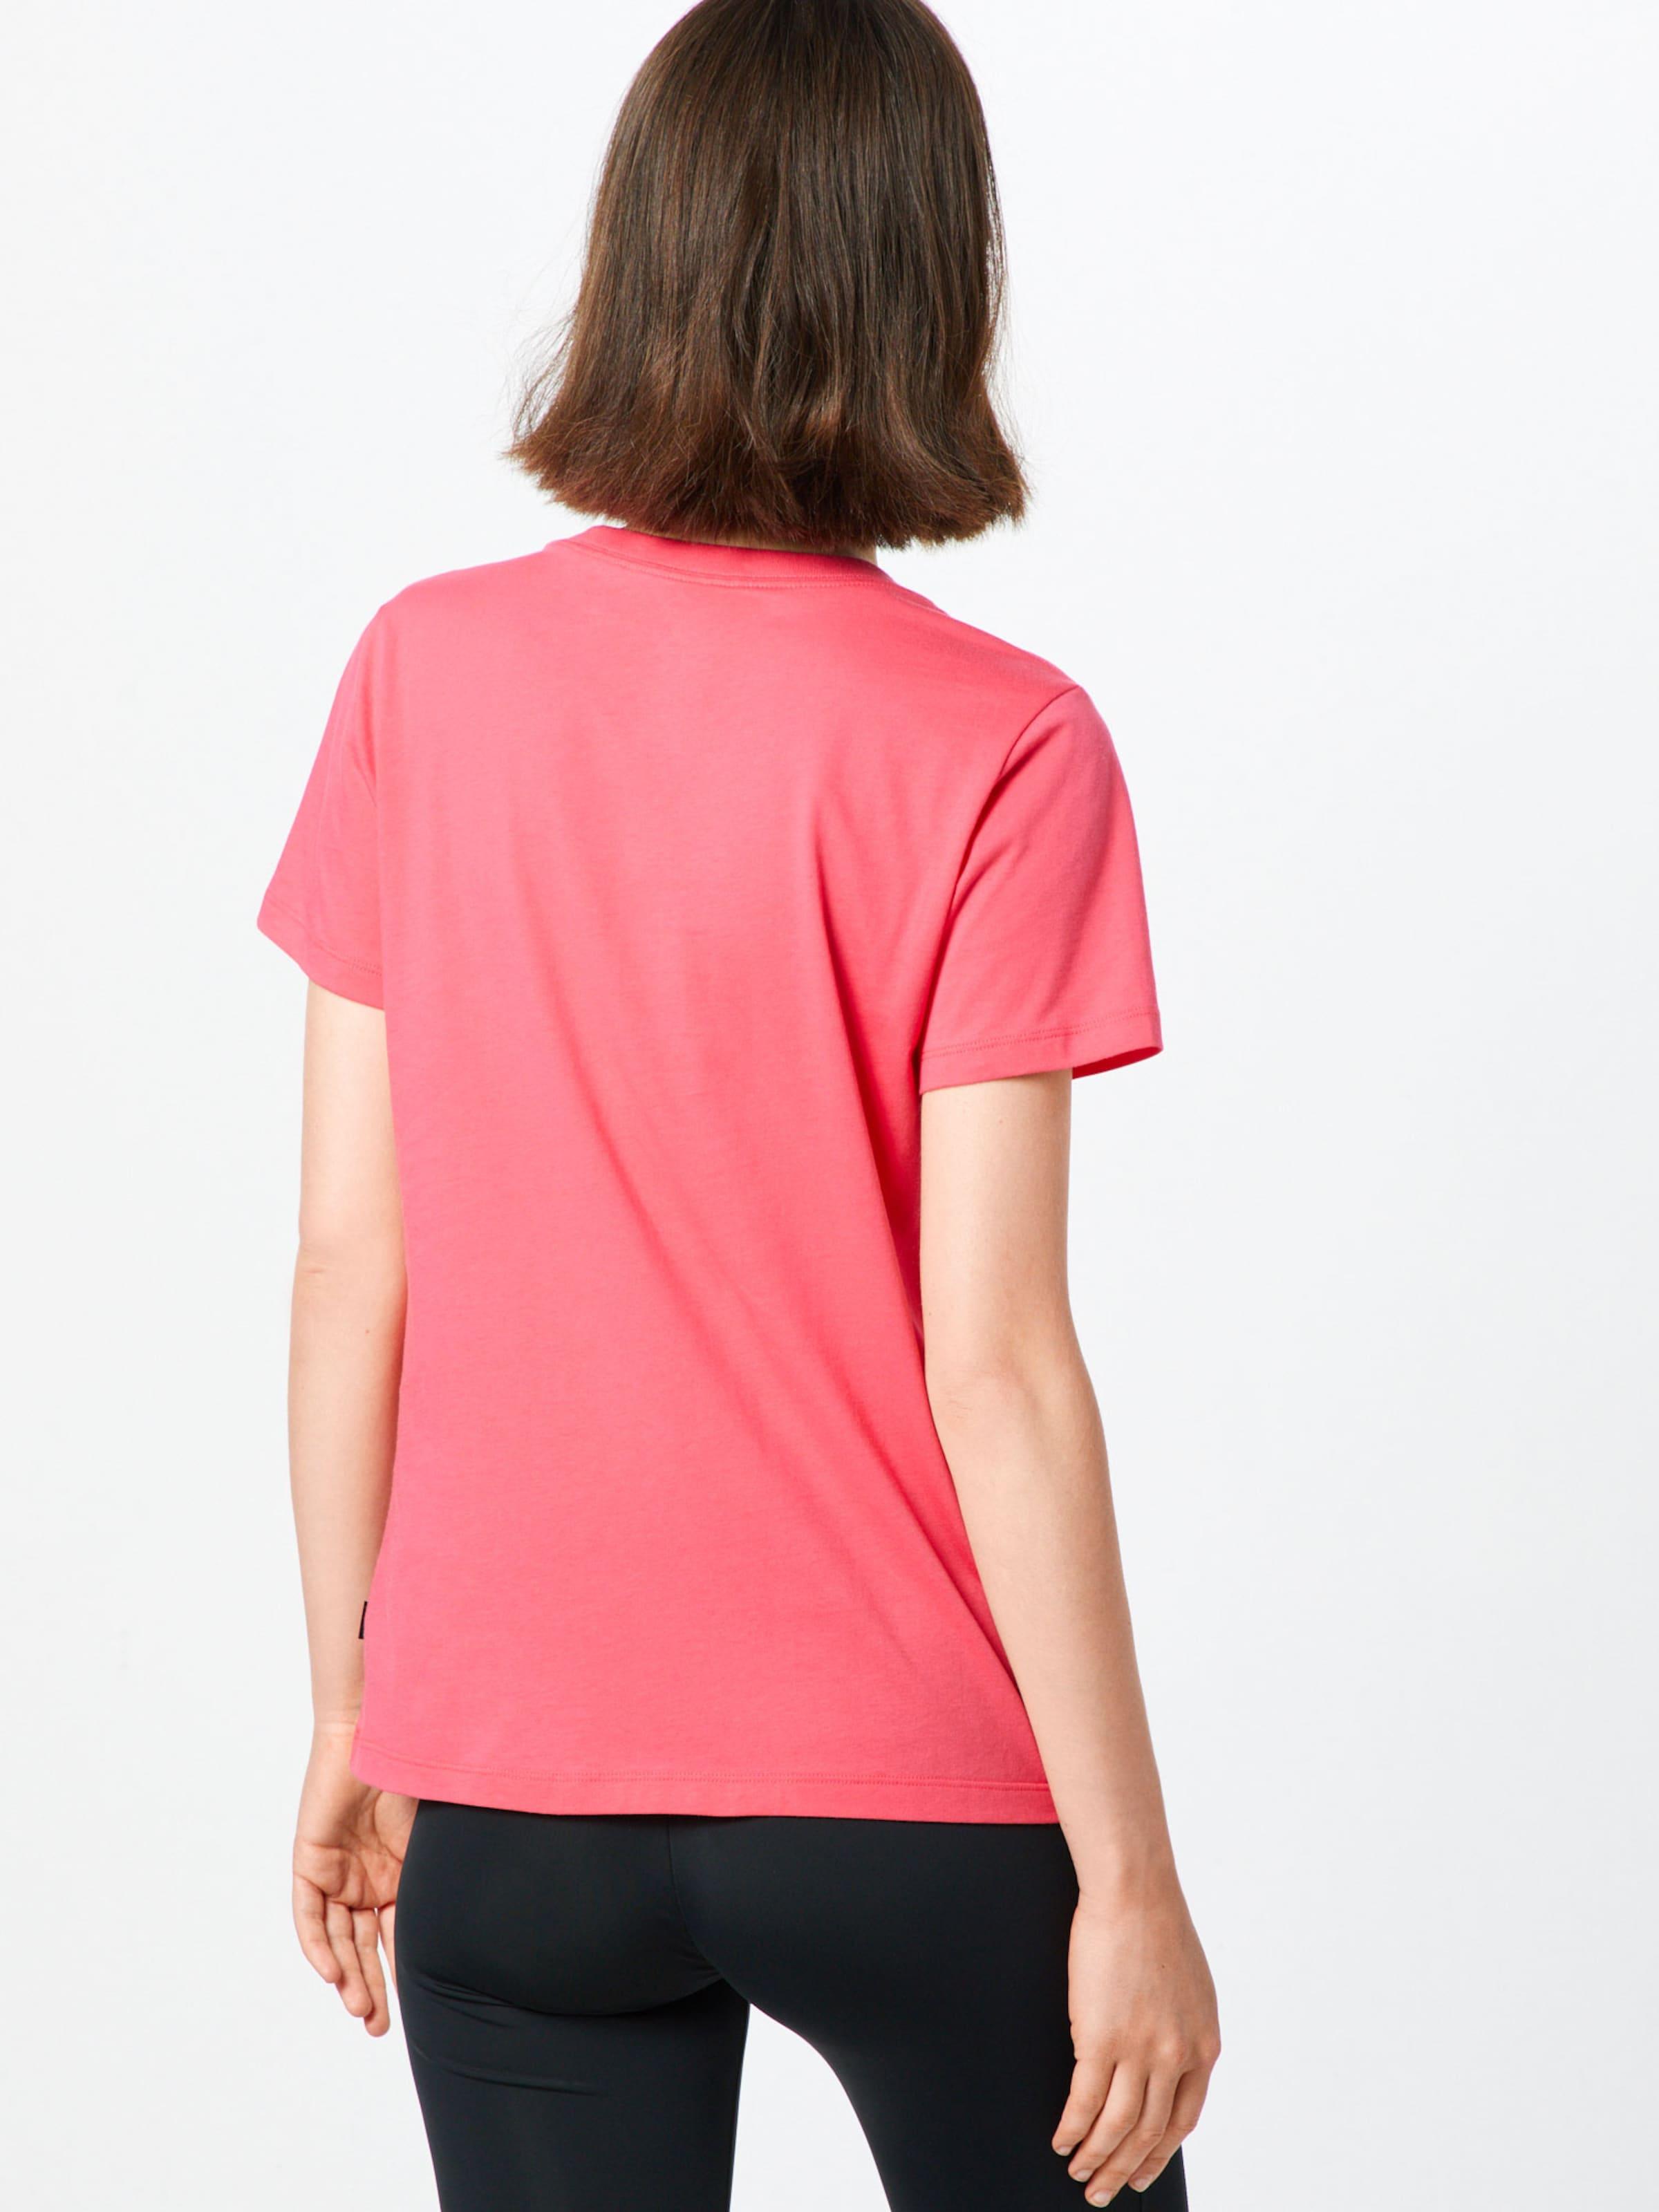 PinkWeiß Shirt 'star Converse In Core' Chevron oexWCBdr